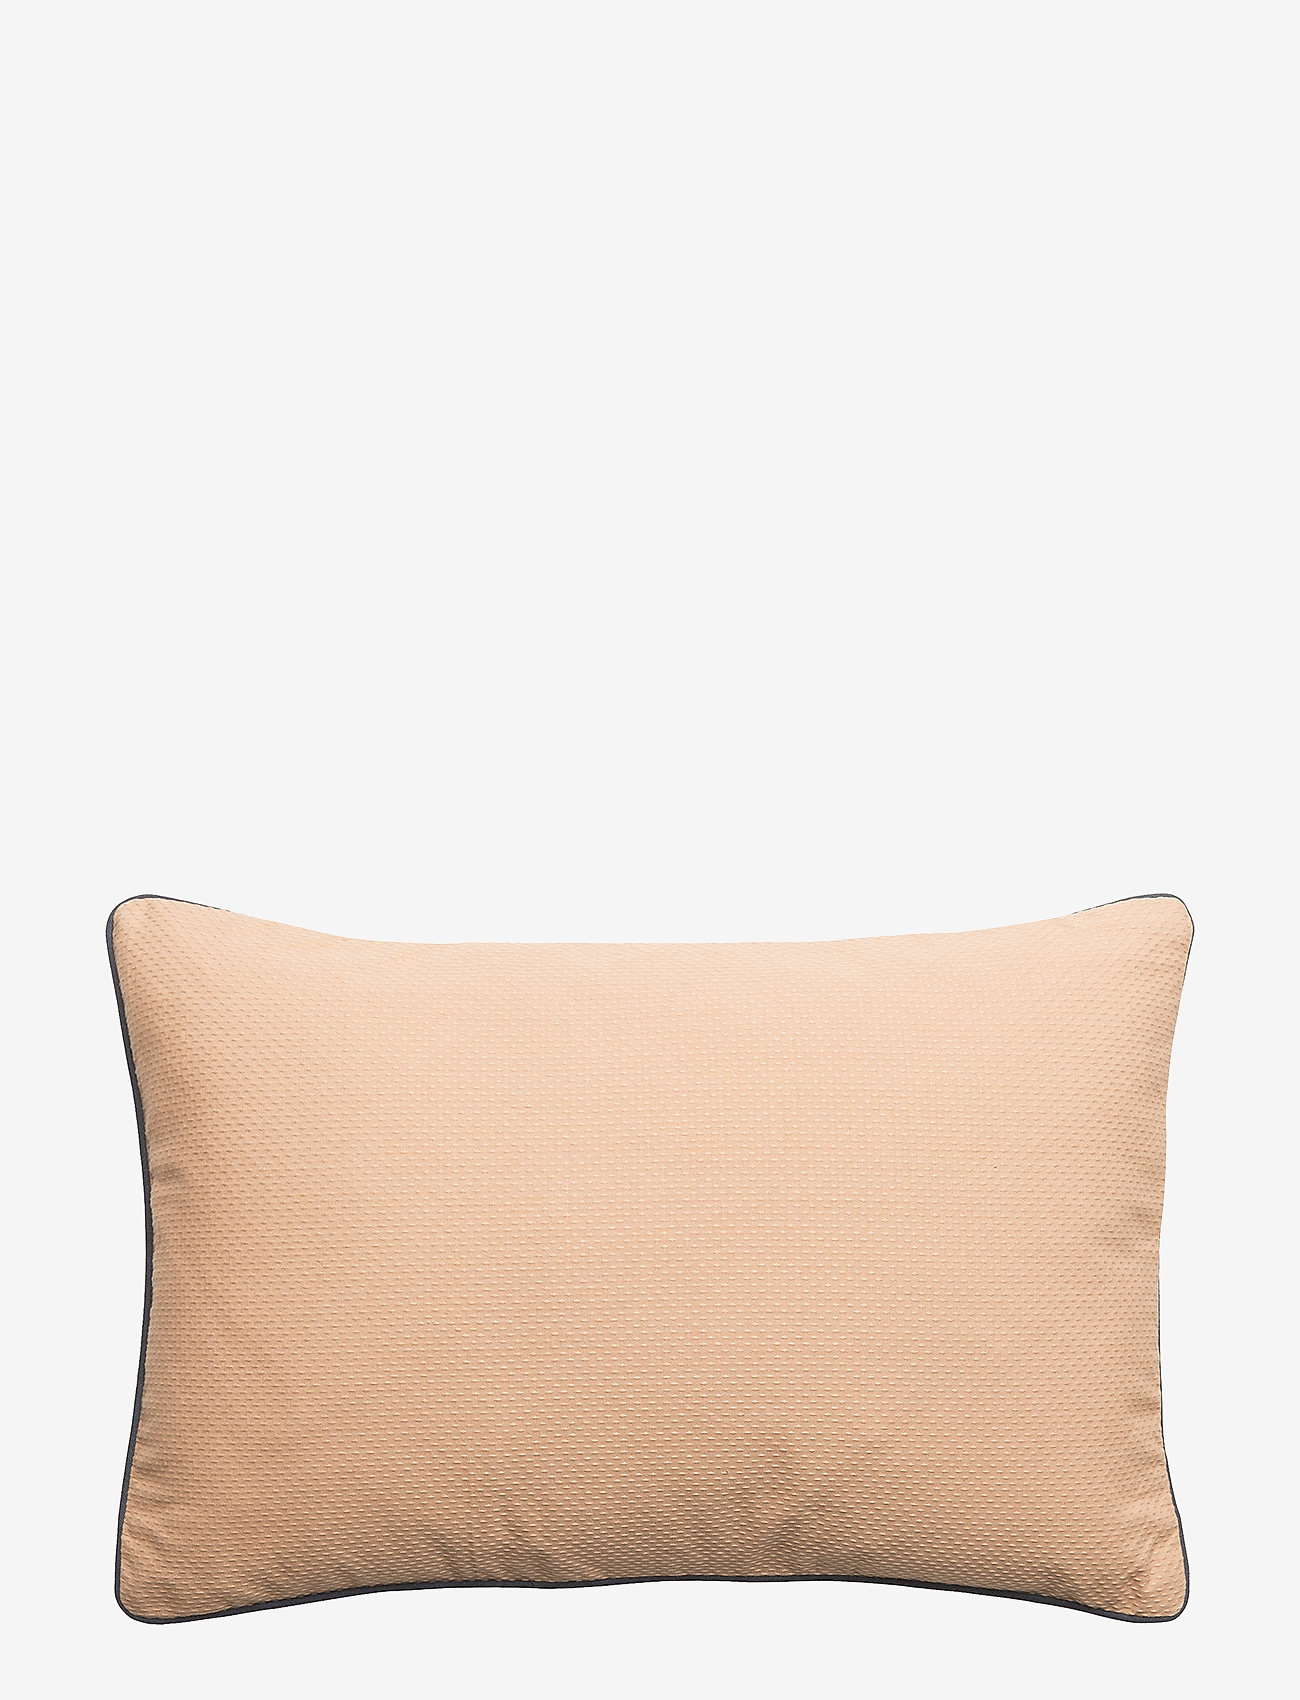 Bloomingville - Cushion, Rose, Cotton - coussins - rose